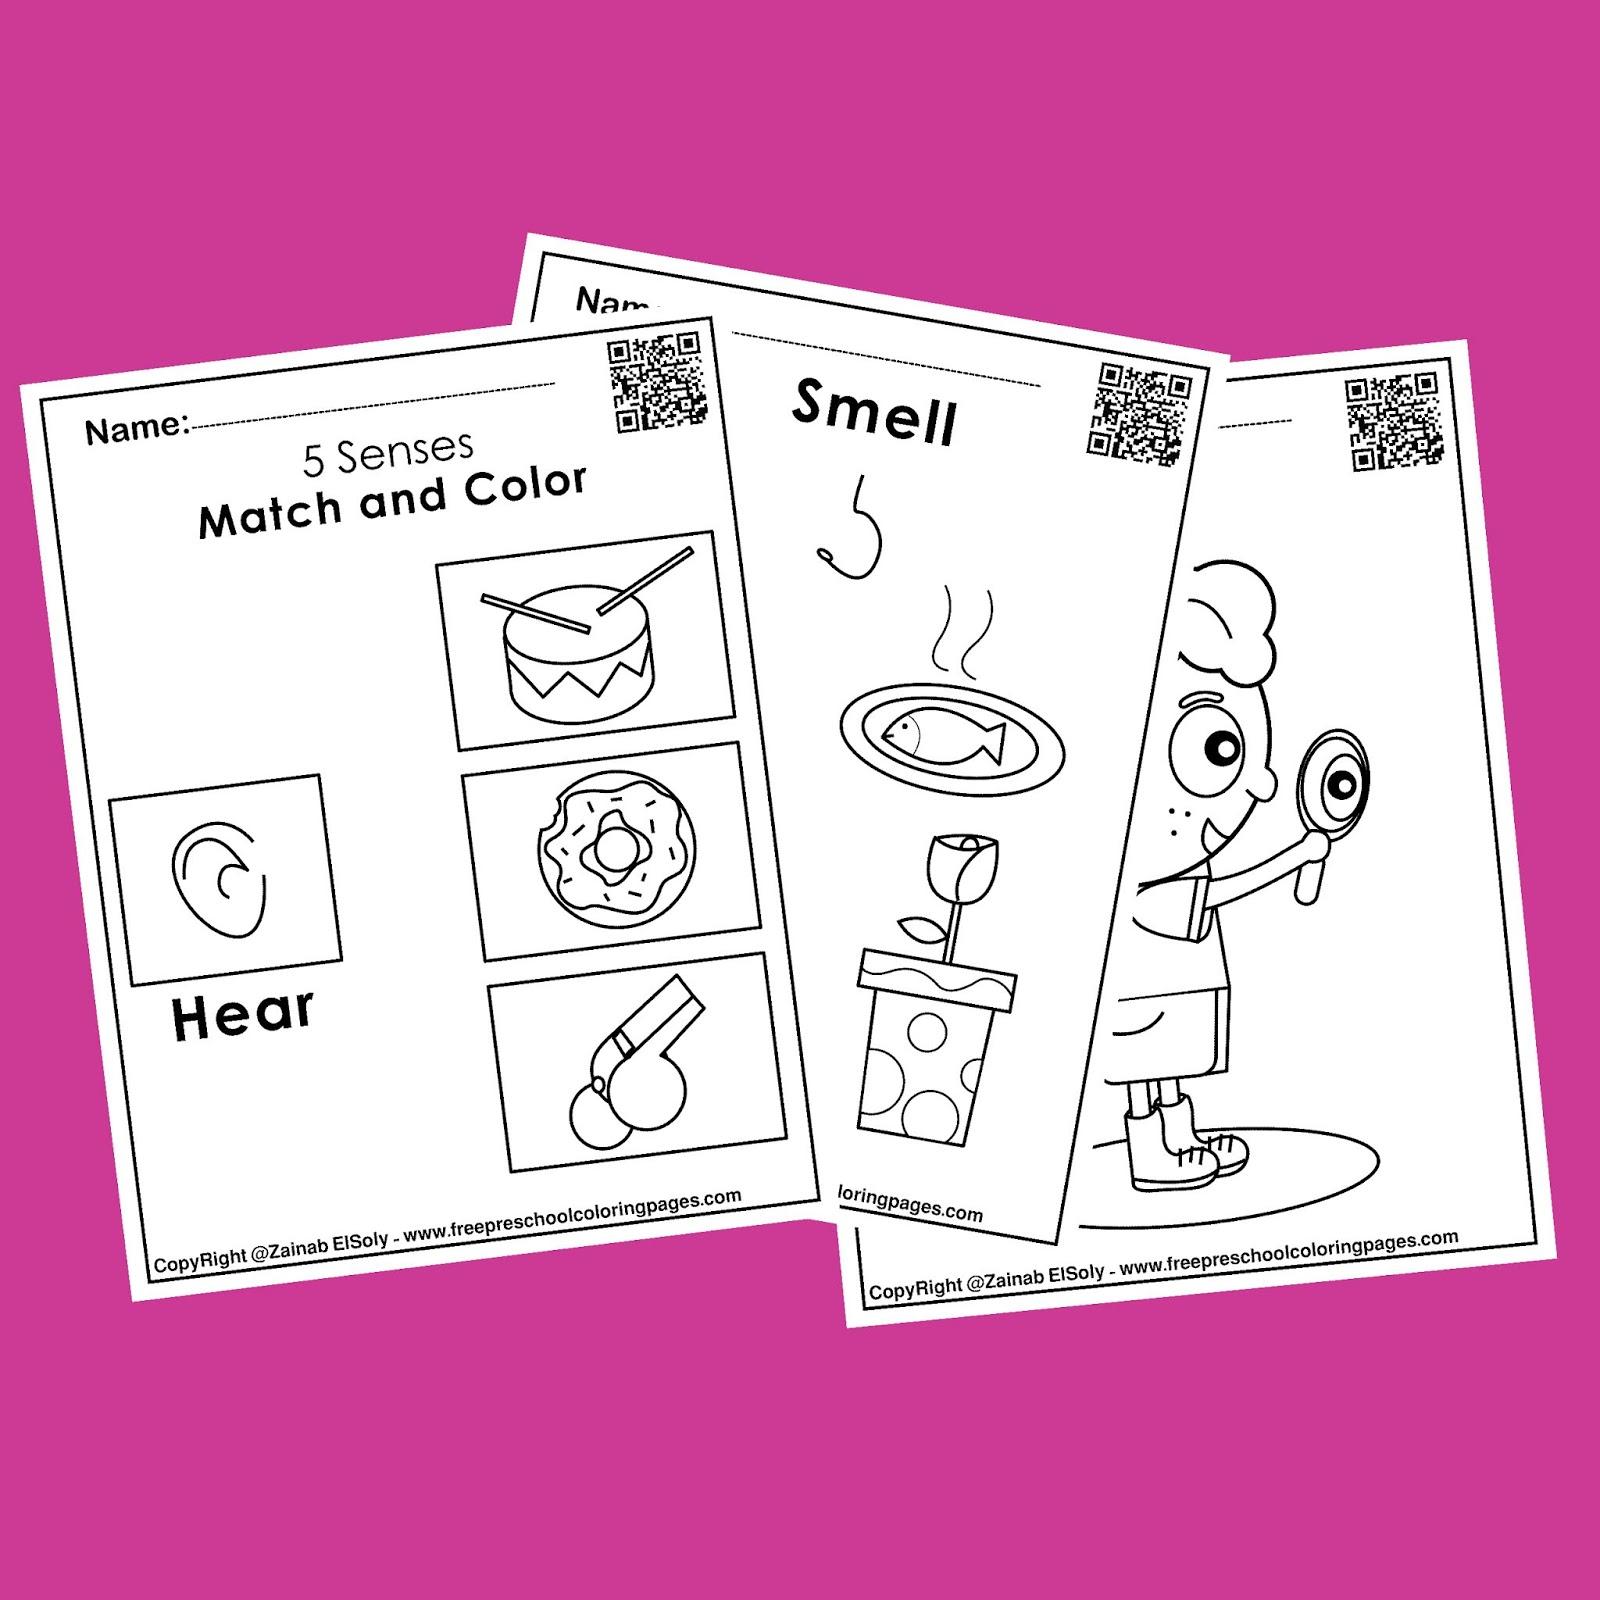 5 Senses Free Worksheets Activities For Kids